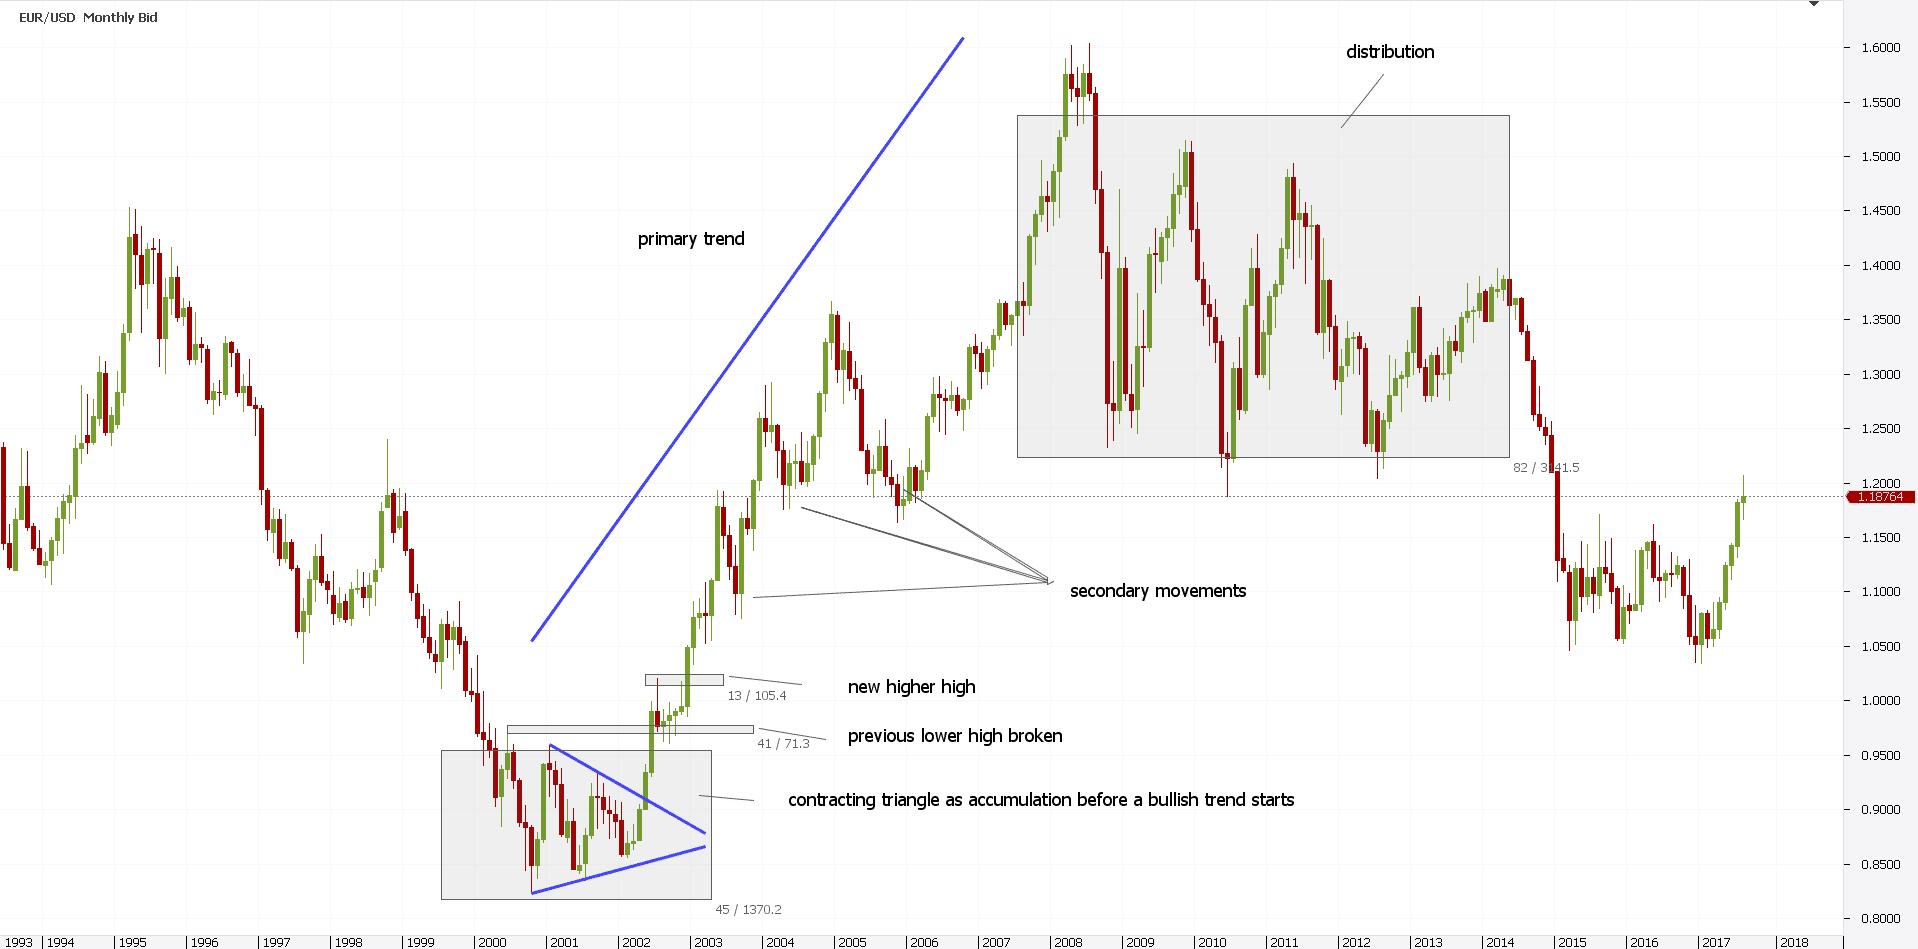 Dow Jones Theory Technical Analysis